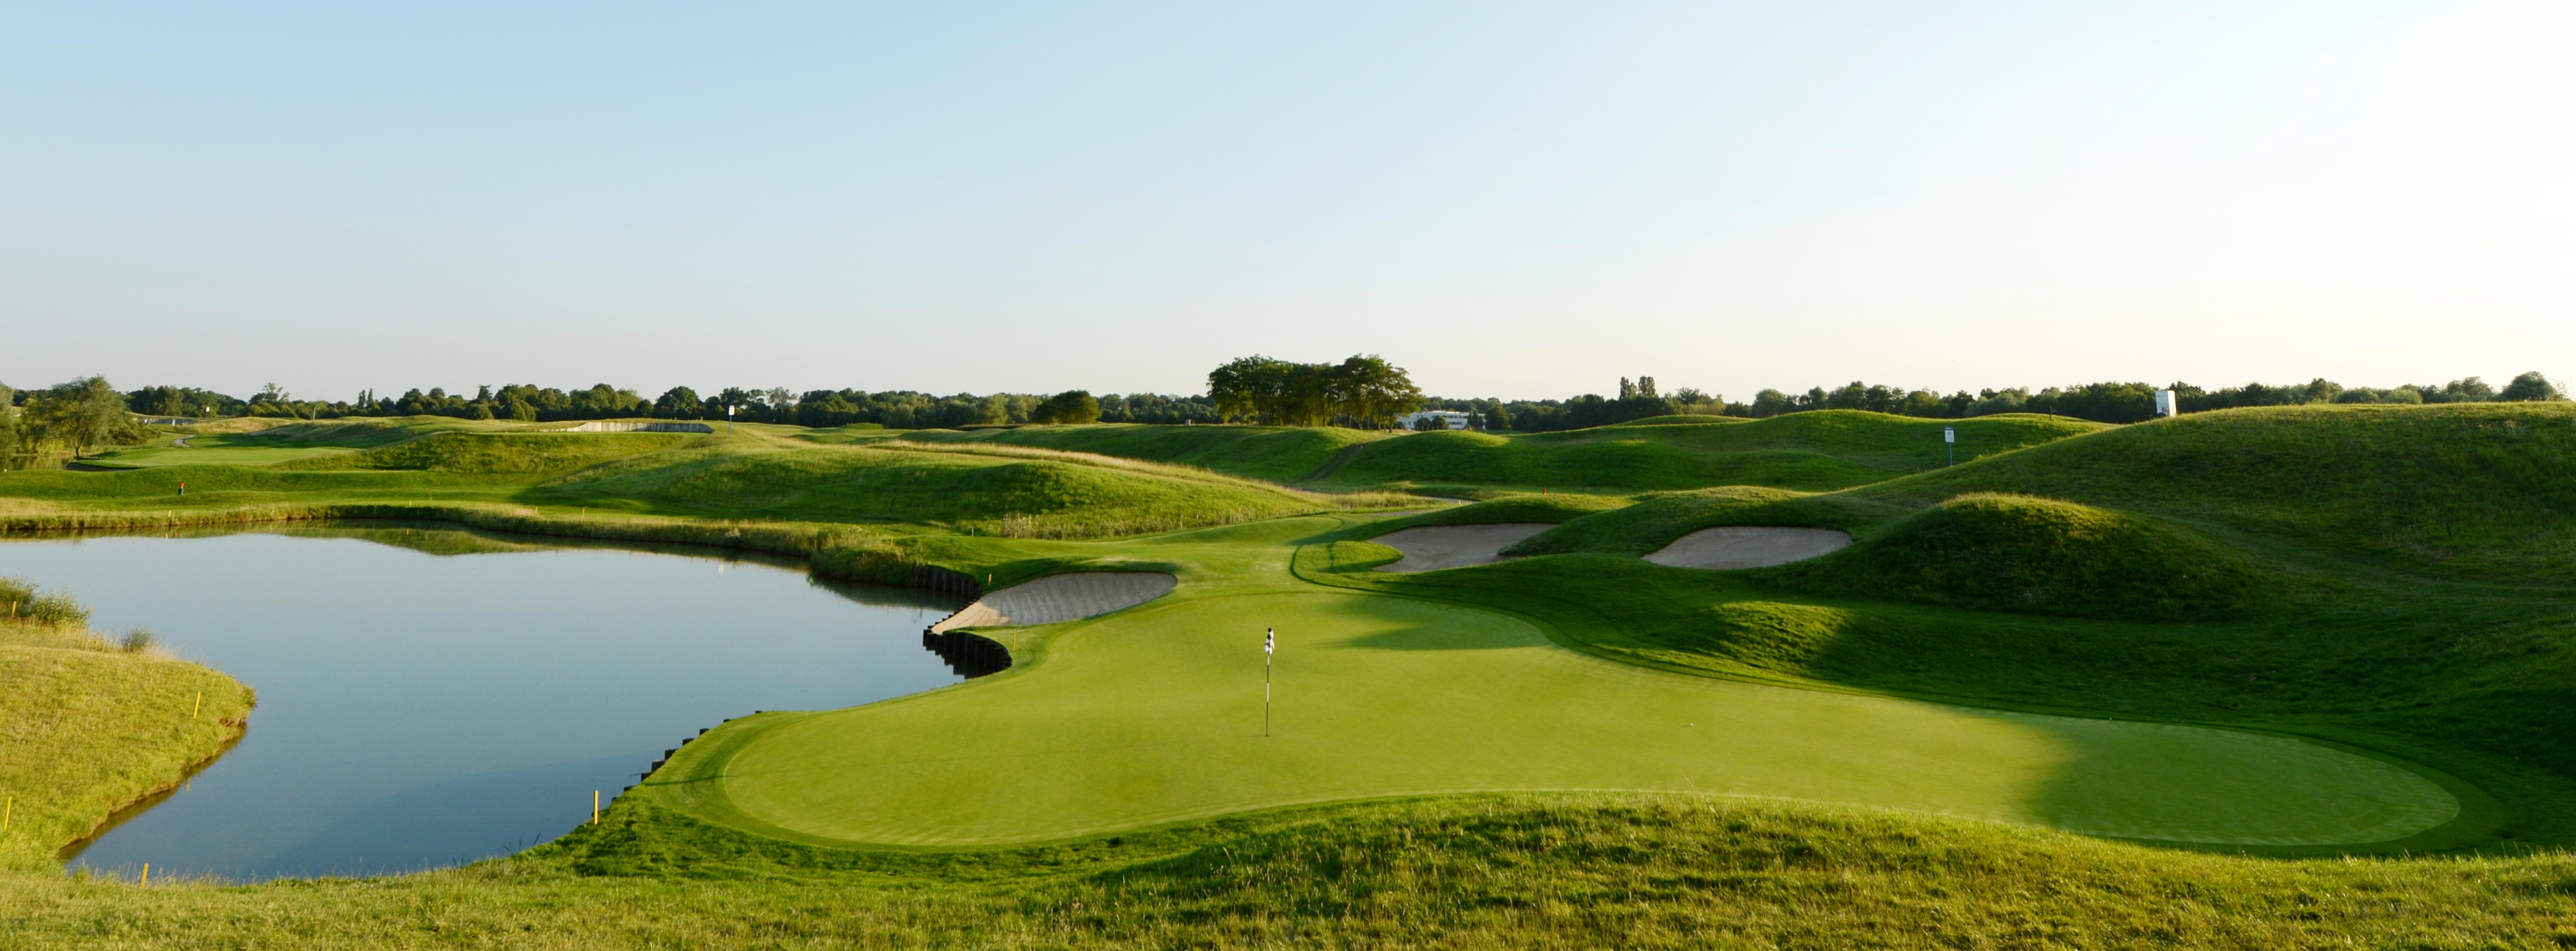 Trou n°16 au Golf National Le Golf National - Millereau - KMS